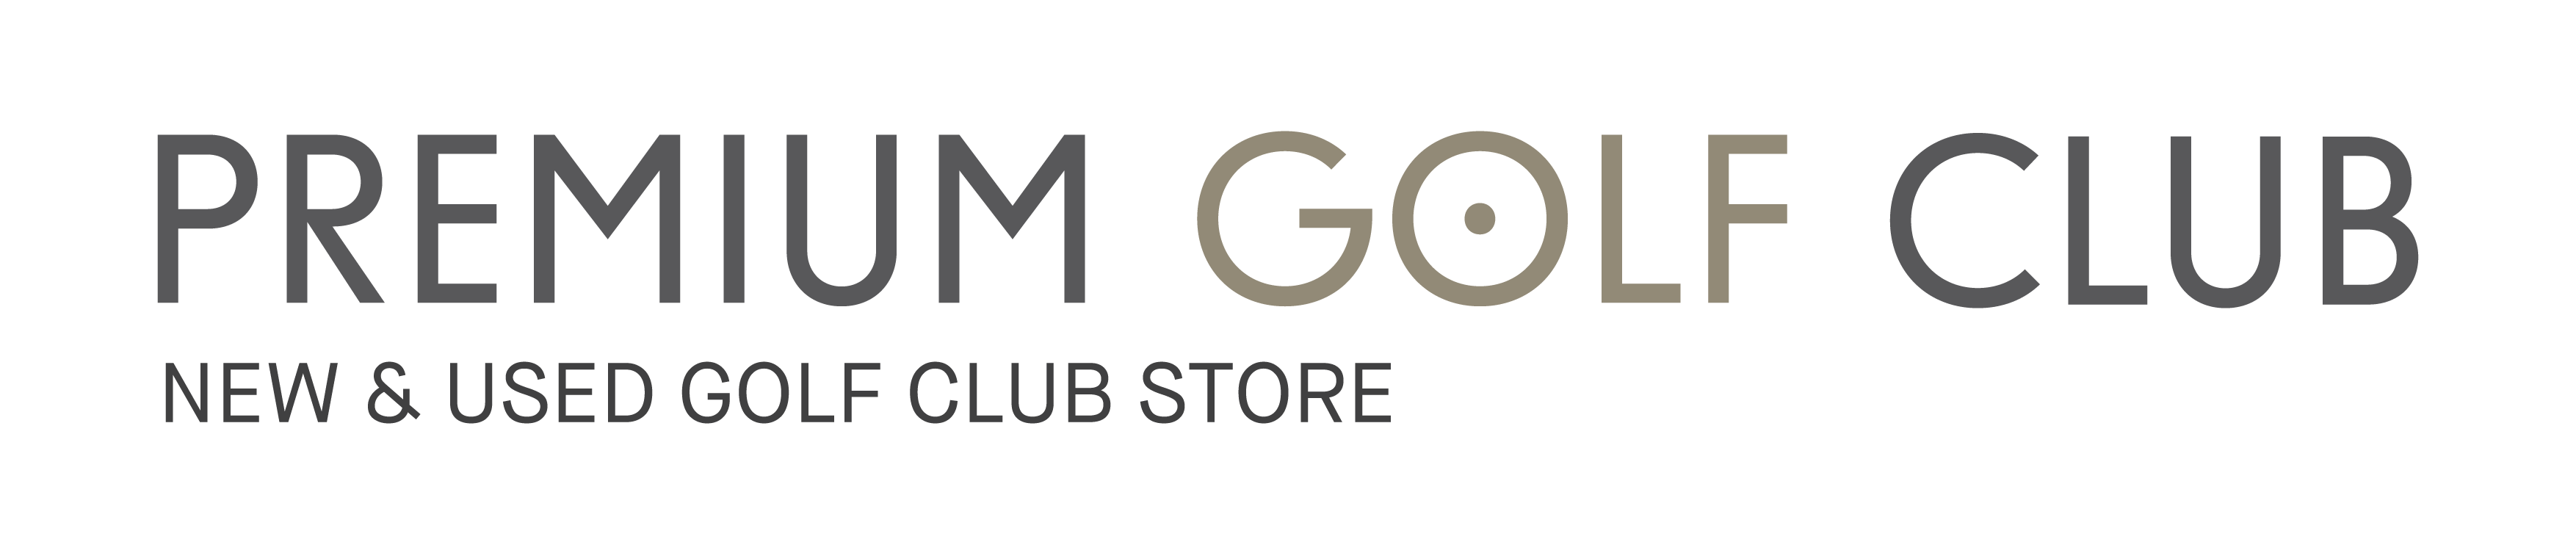 banner ร้านขายไม้กอล์ฟมือสอง PremiumGolfClub